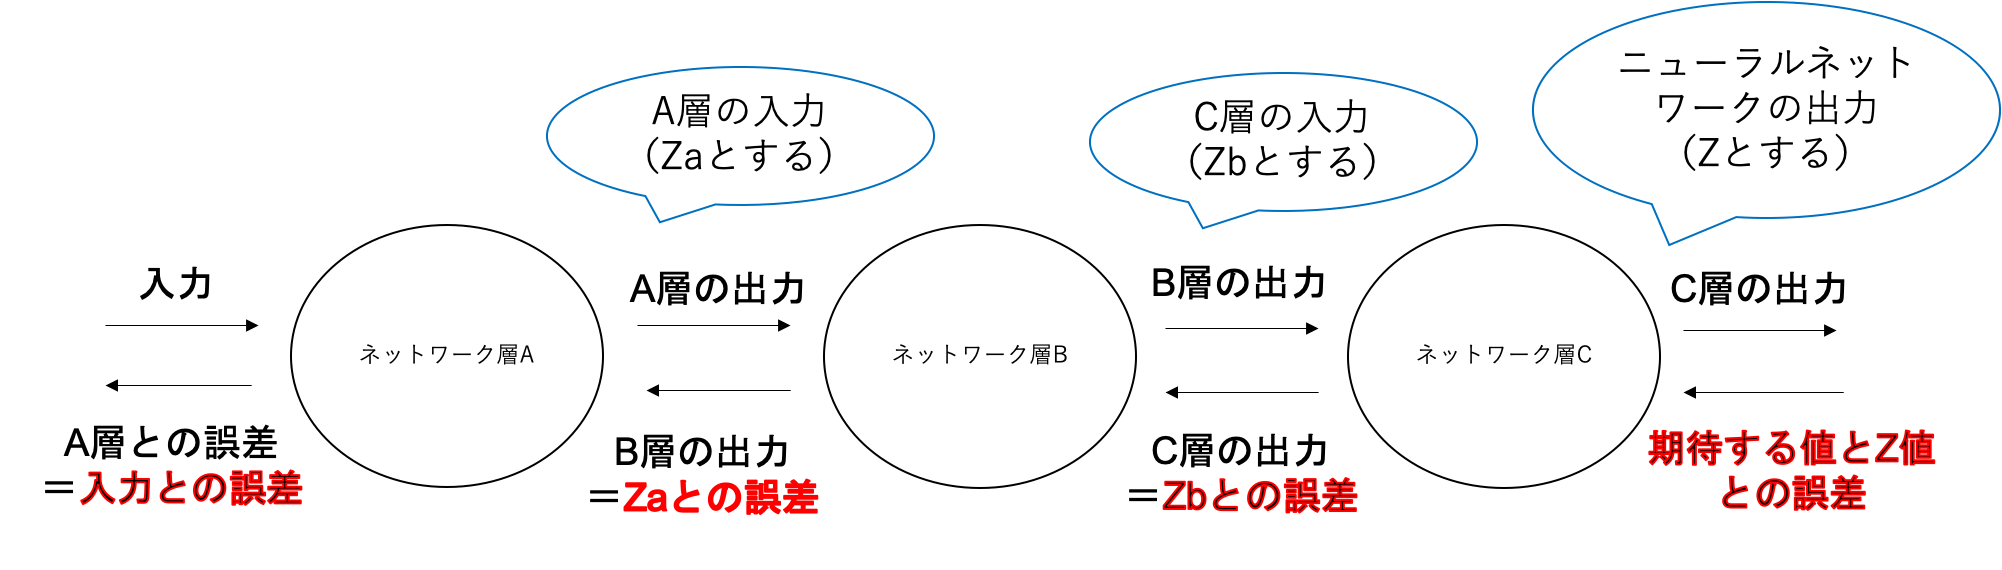 Affine計算グラフ逆伝搬.png